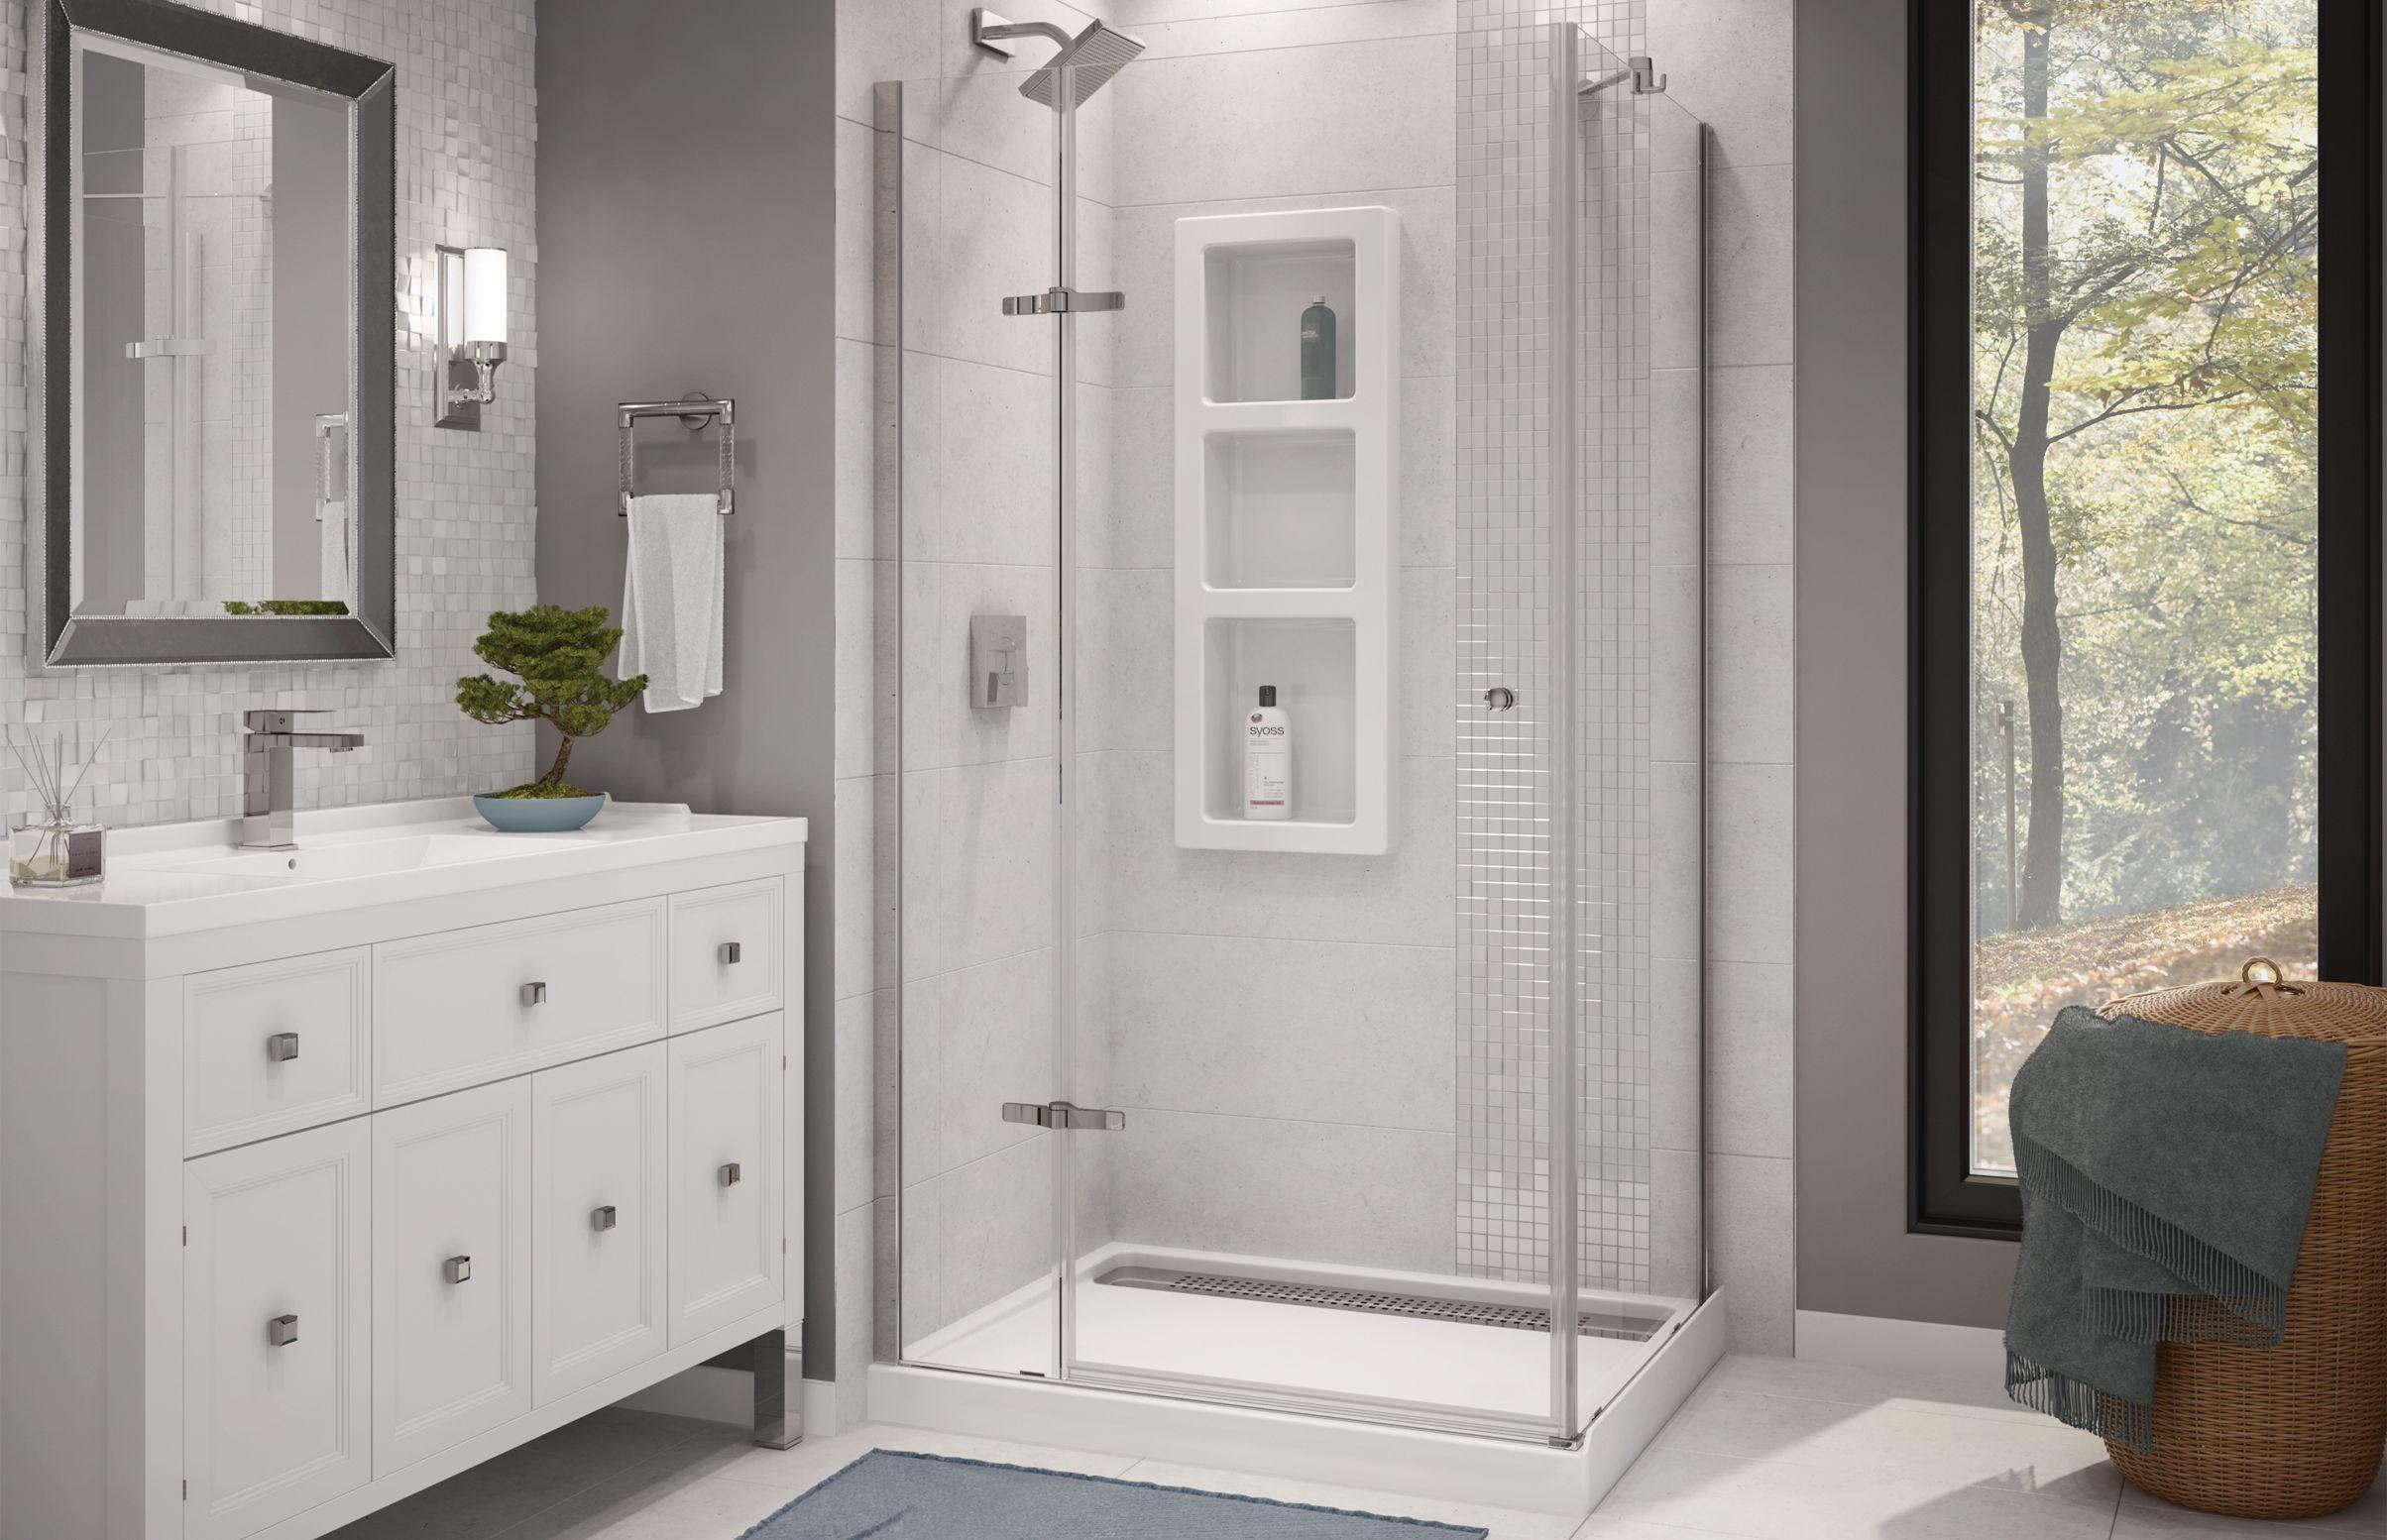 Athena In 2019 Living Spaces Corner Shower Kits Shower Kits Bathroom